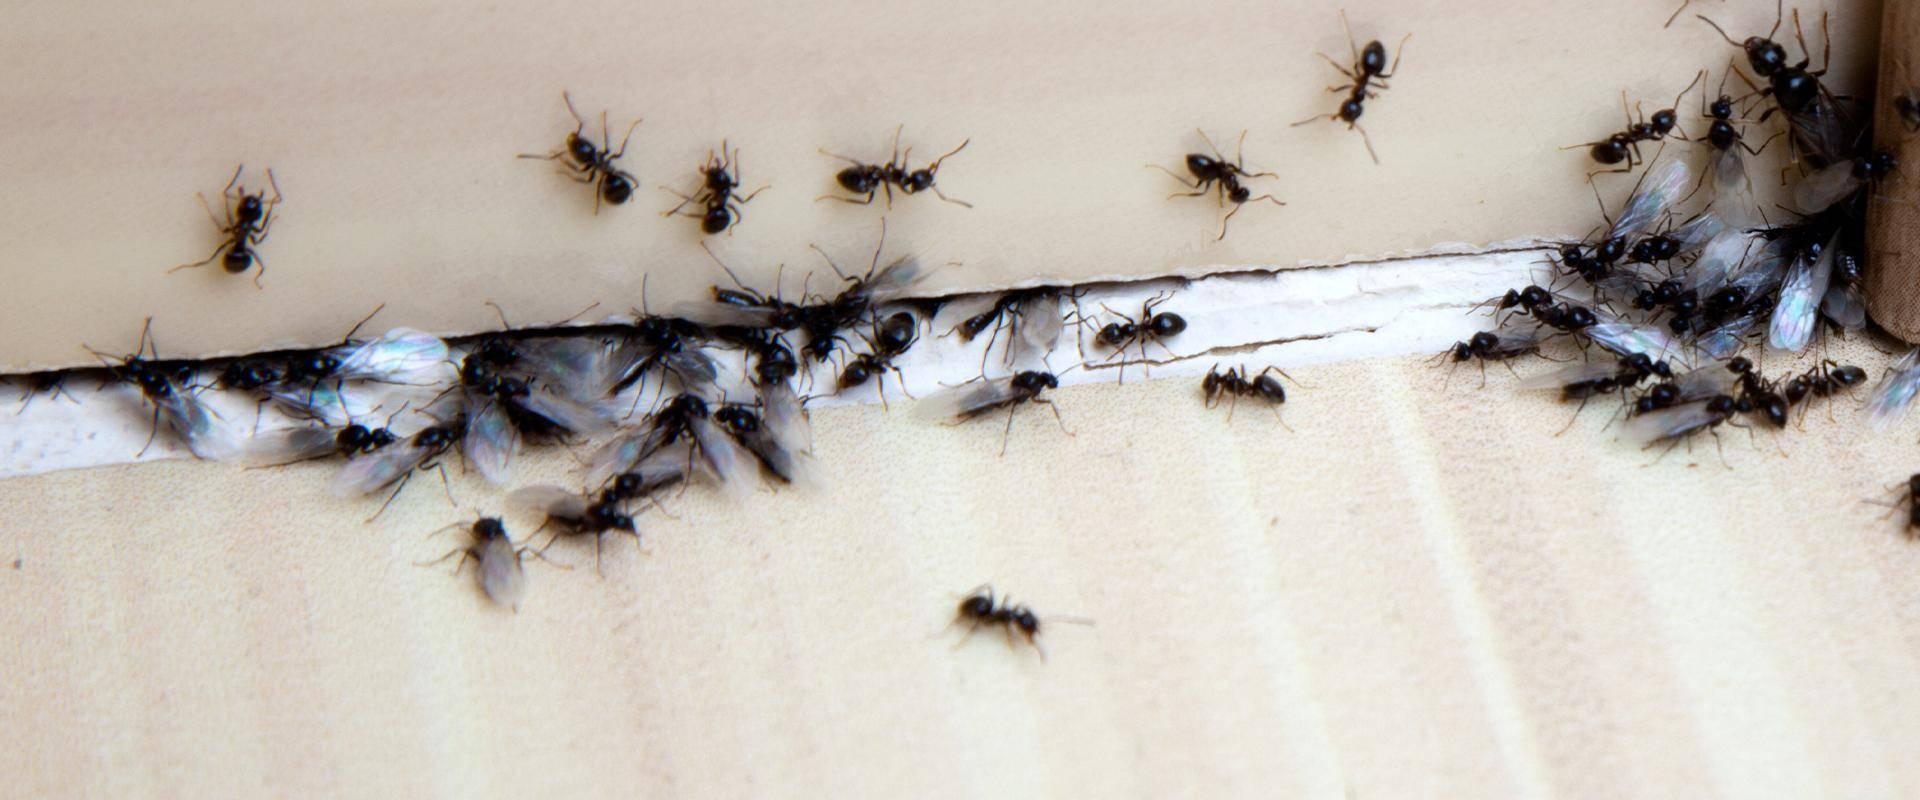 ants on a baseboard